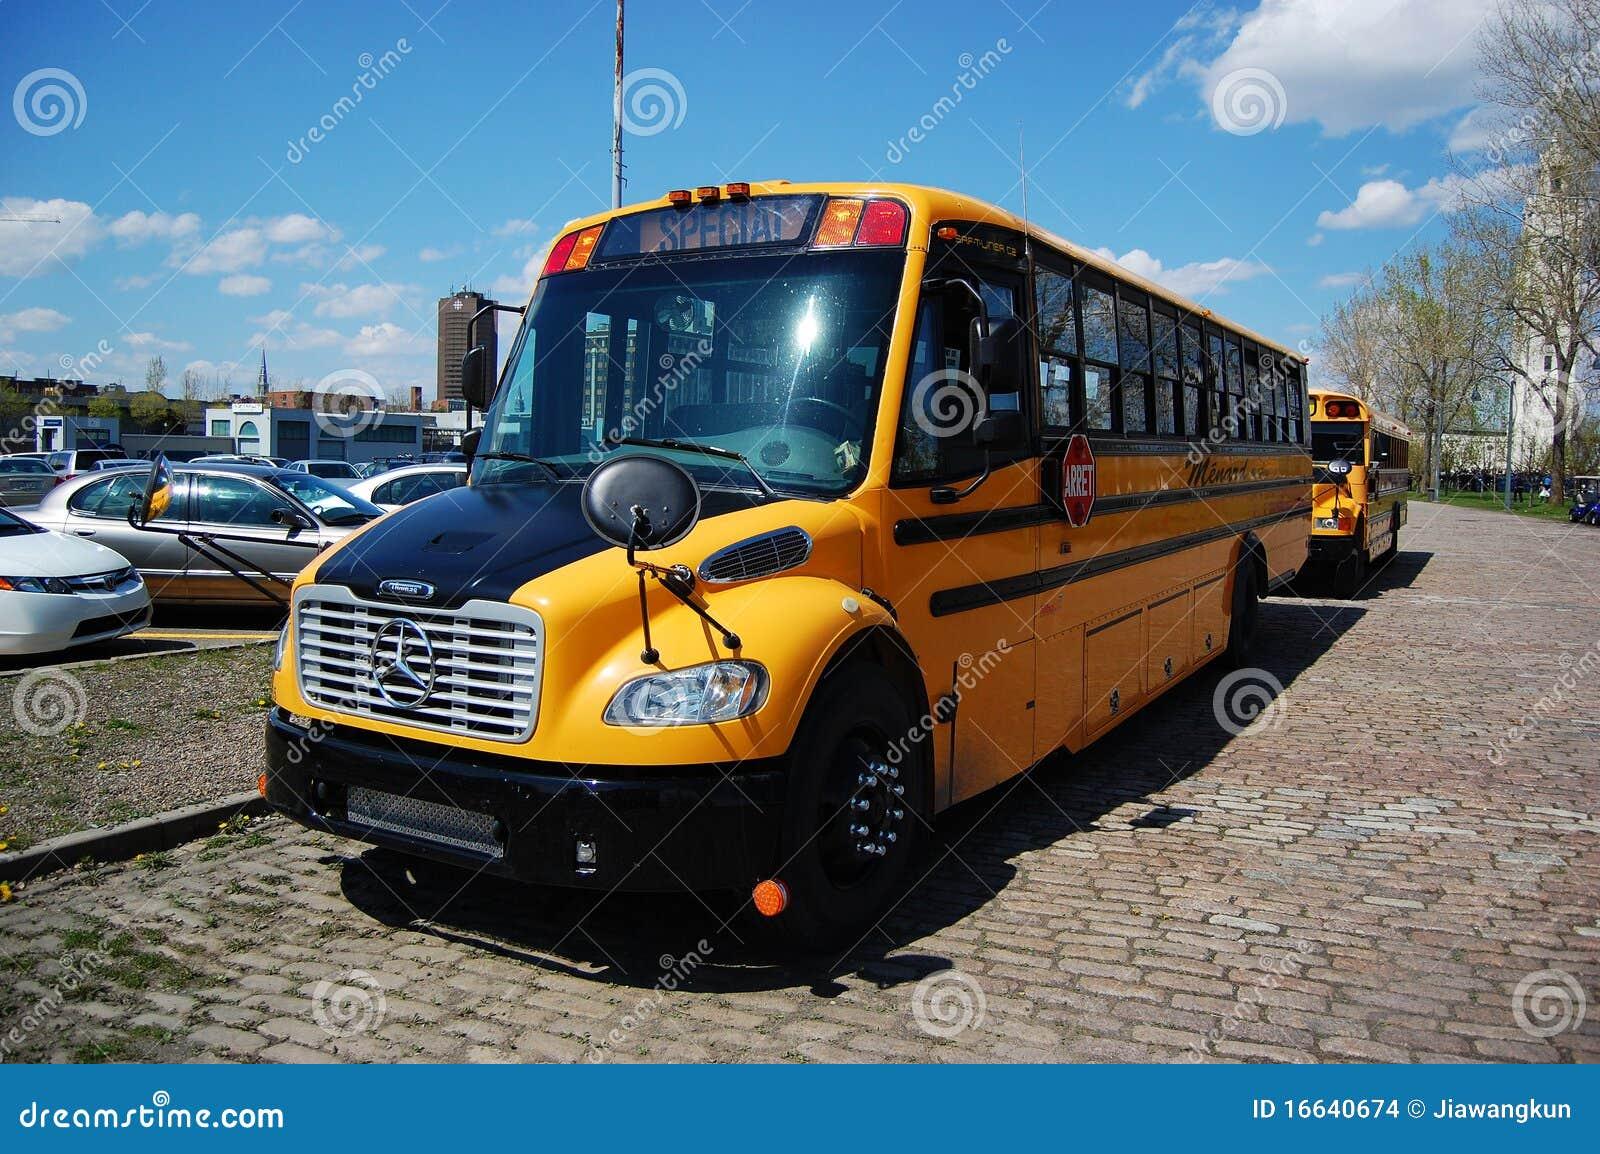 School bus in montreal editorial stock image image of for Mercedes benz school